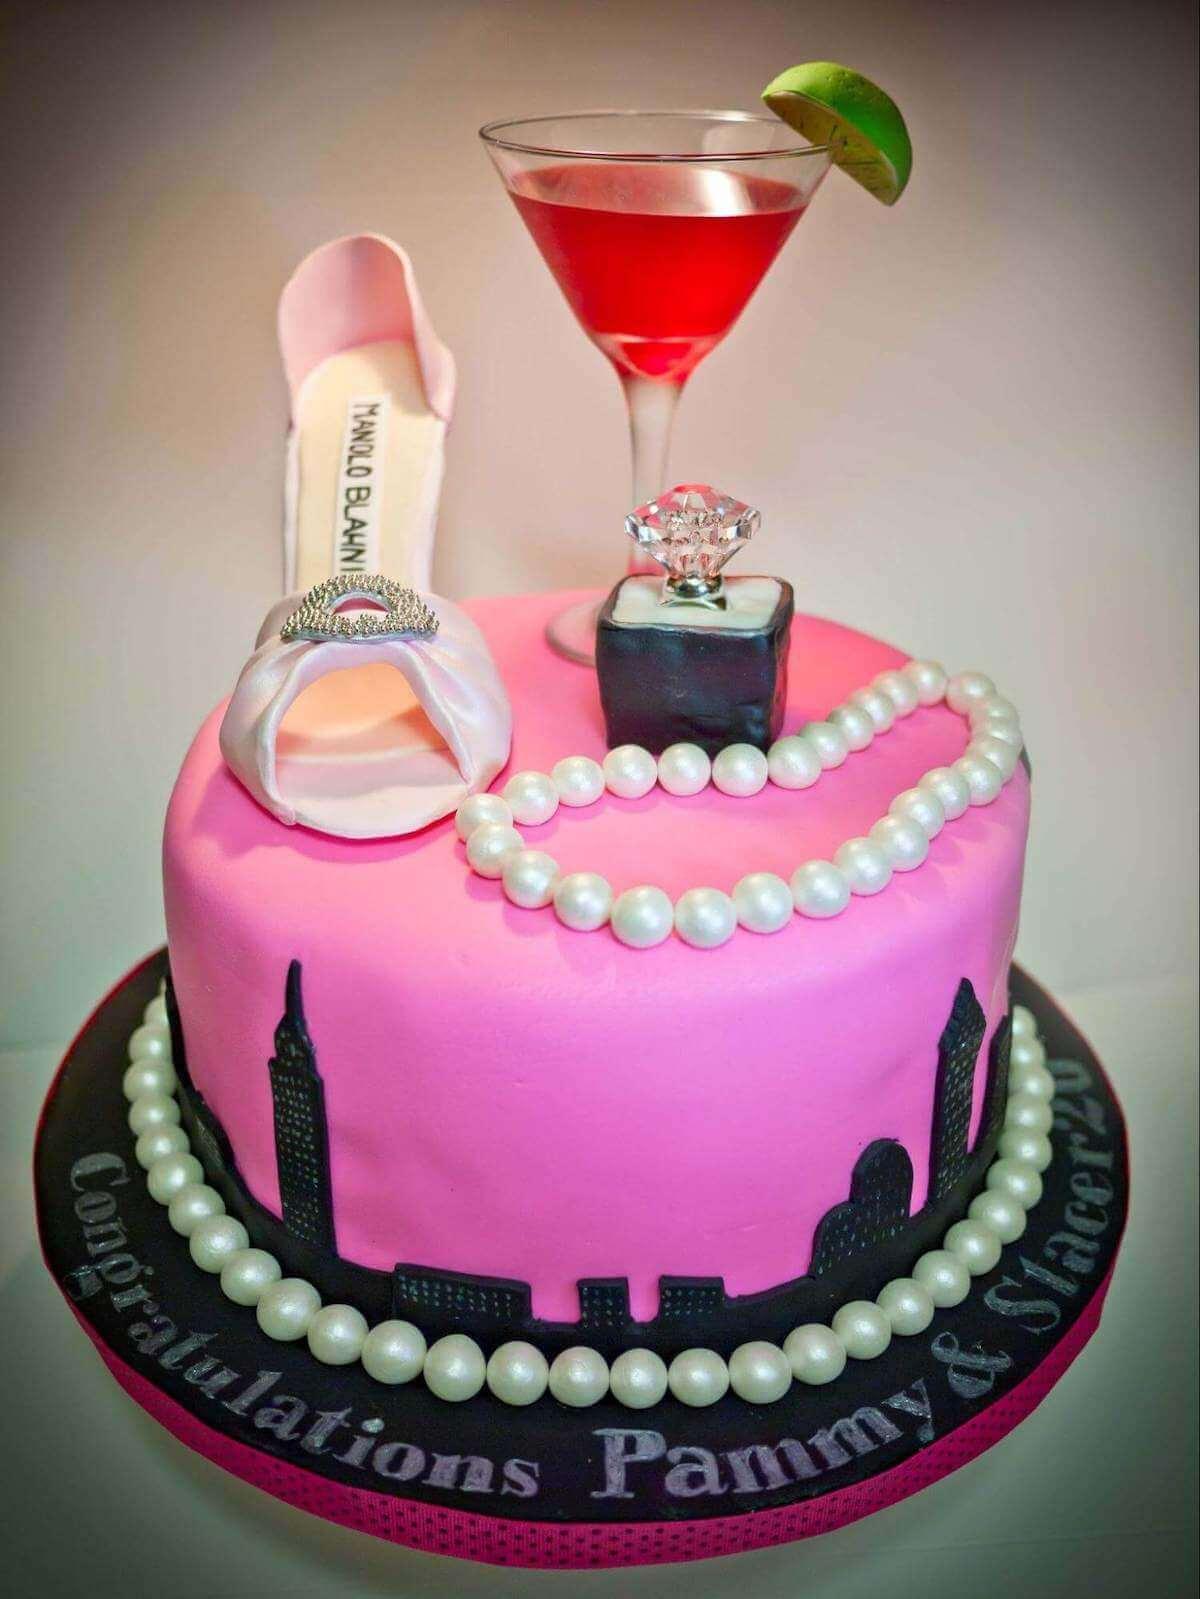 bachelorette cakes ideas: Martini Cake